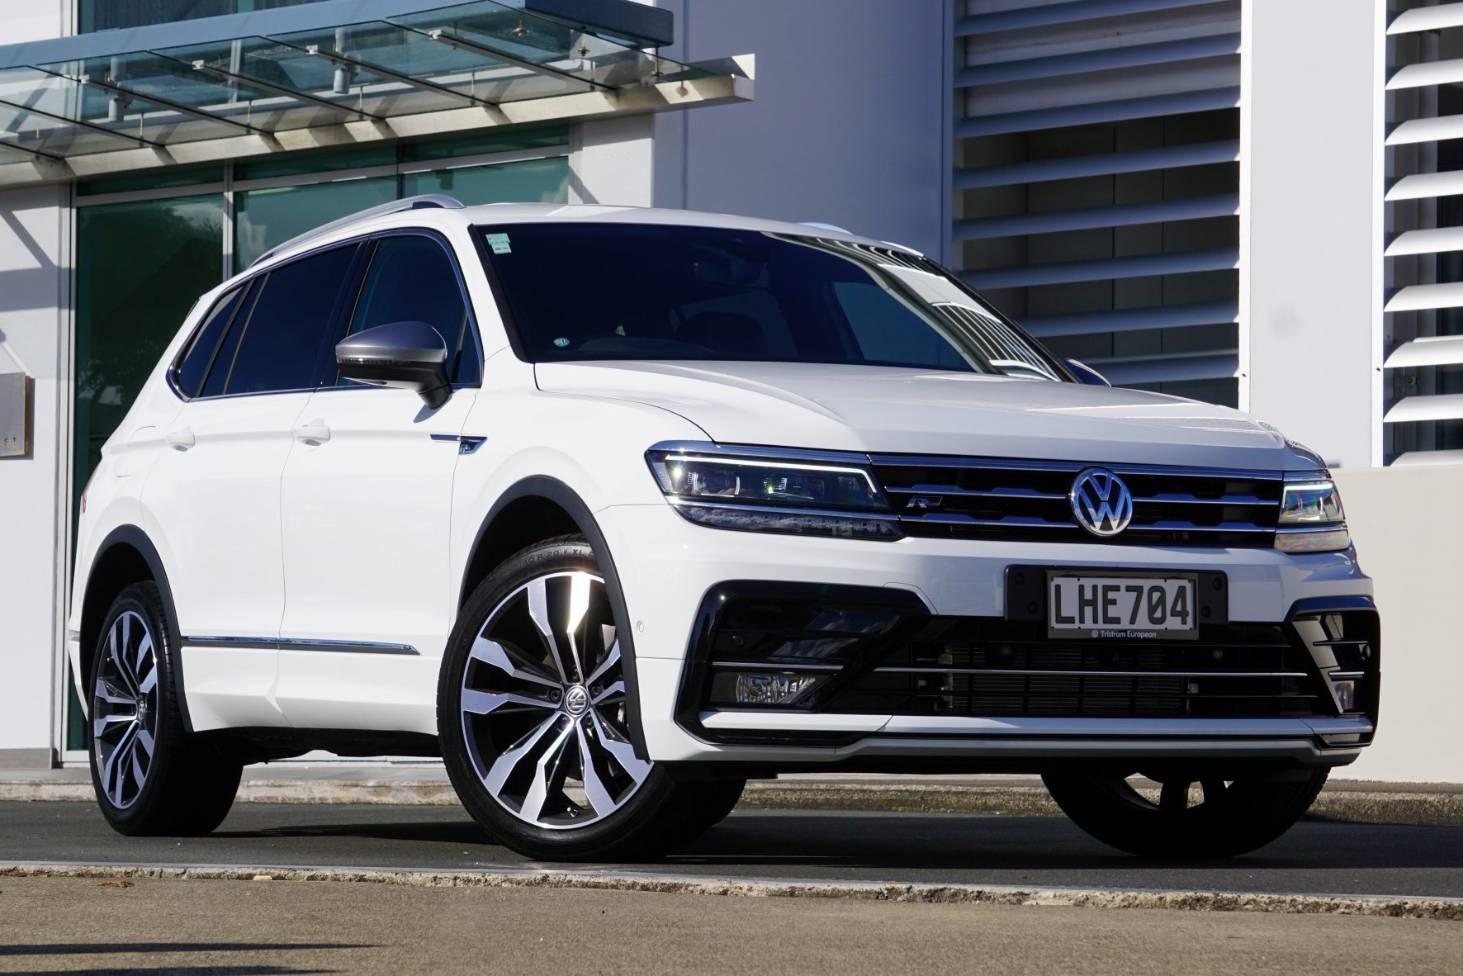 How Volkswagen has made the Tiguan Allspace the torque of